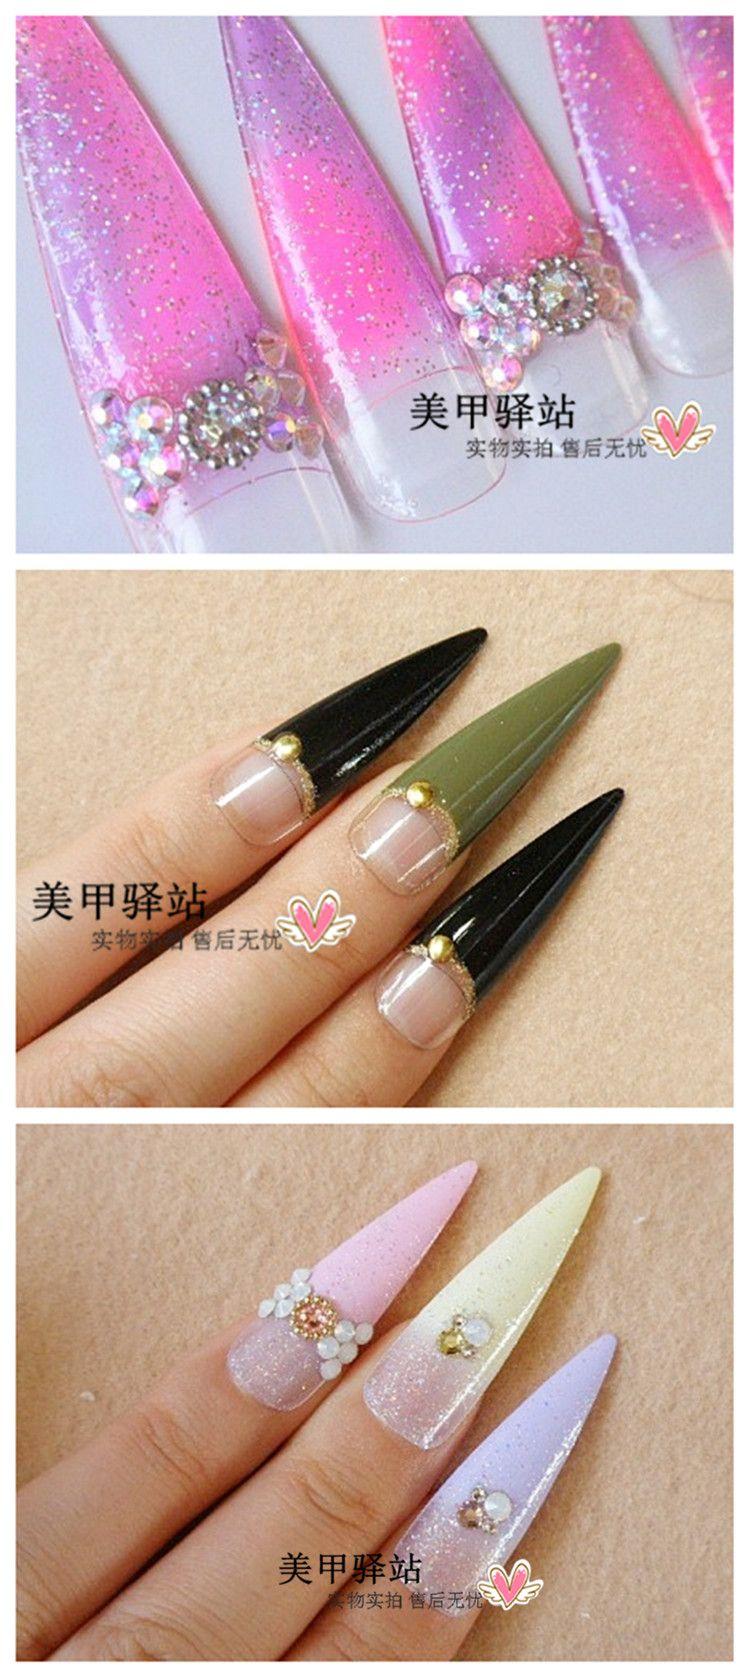 Manicure Diy Fake Nail A Set Of 10 Semi Transparent Natural Color ...